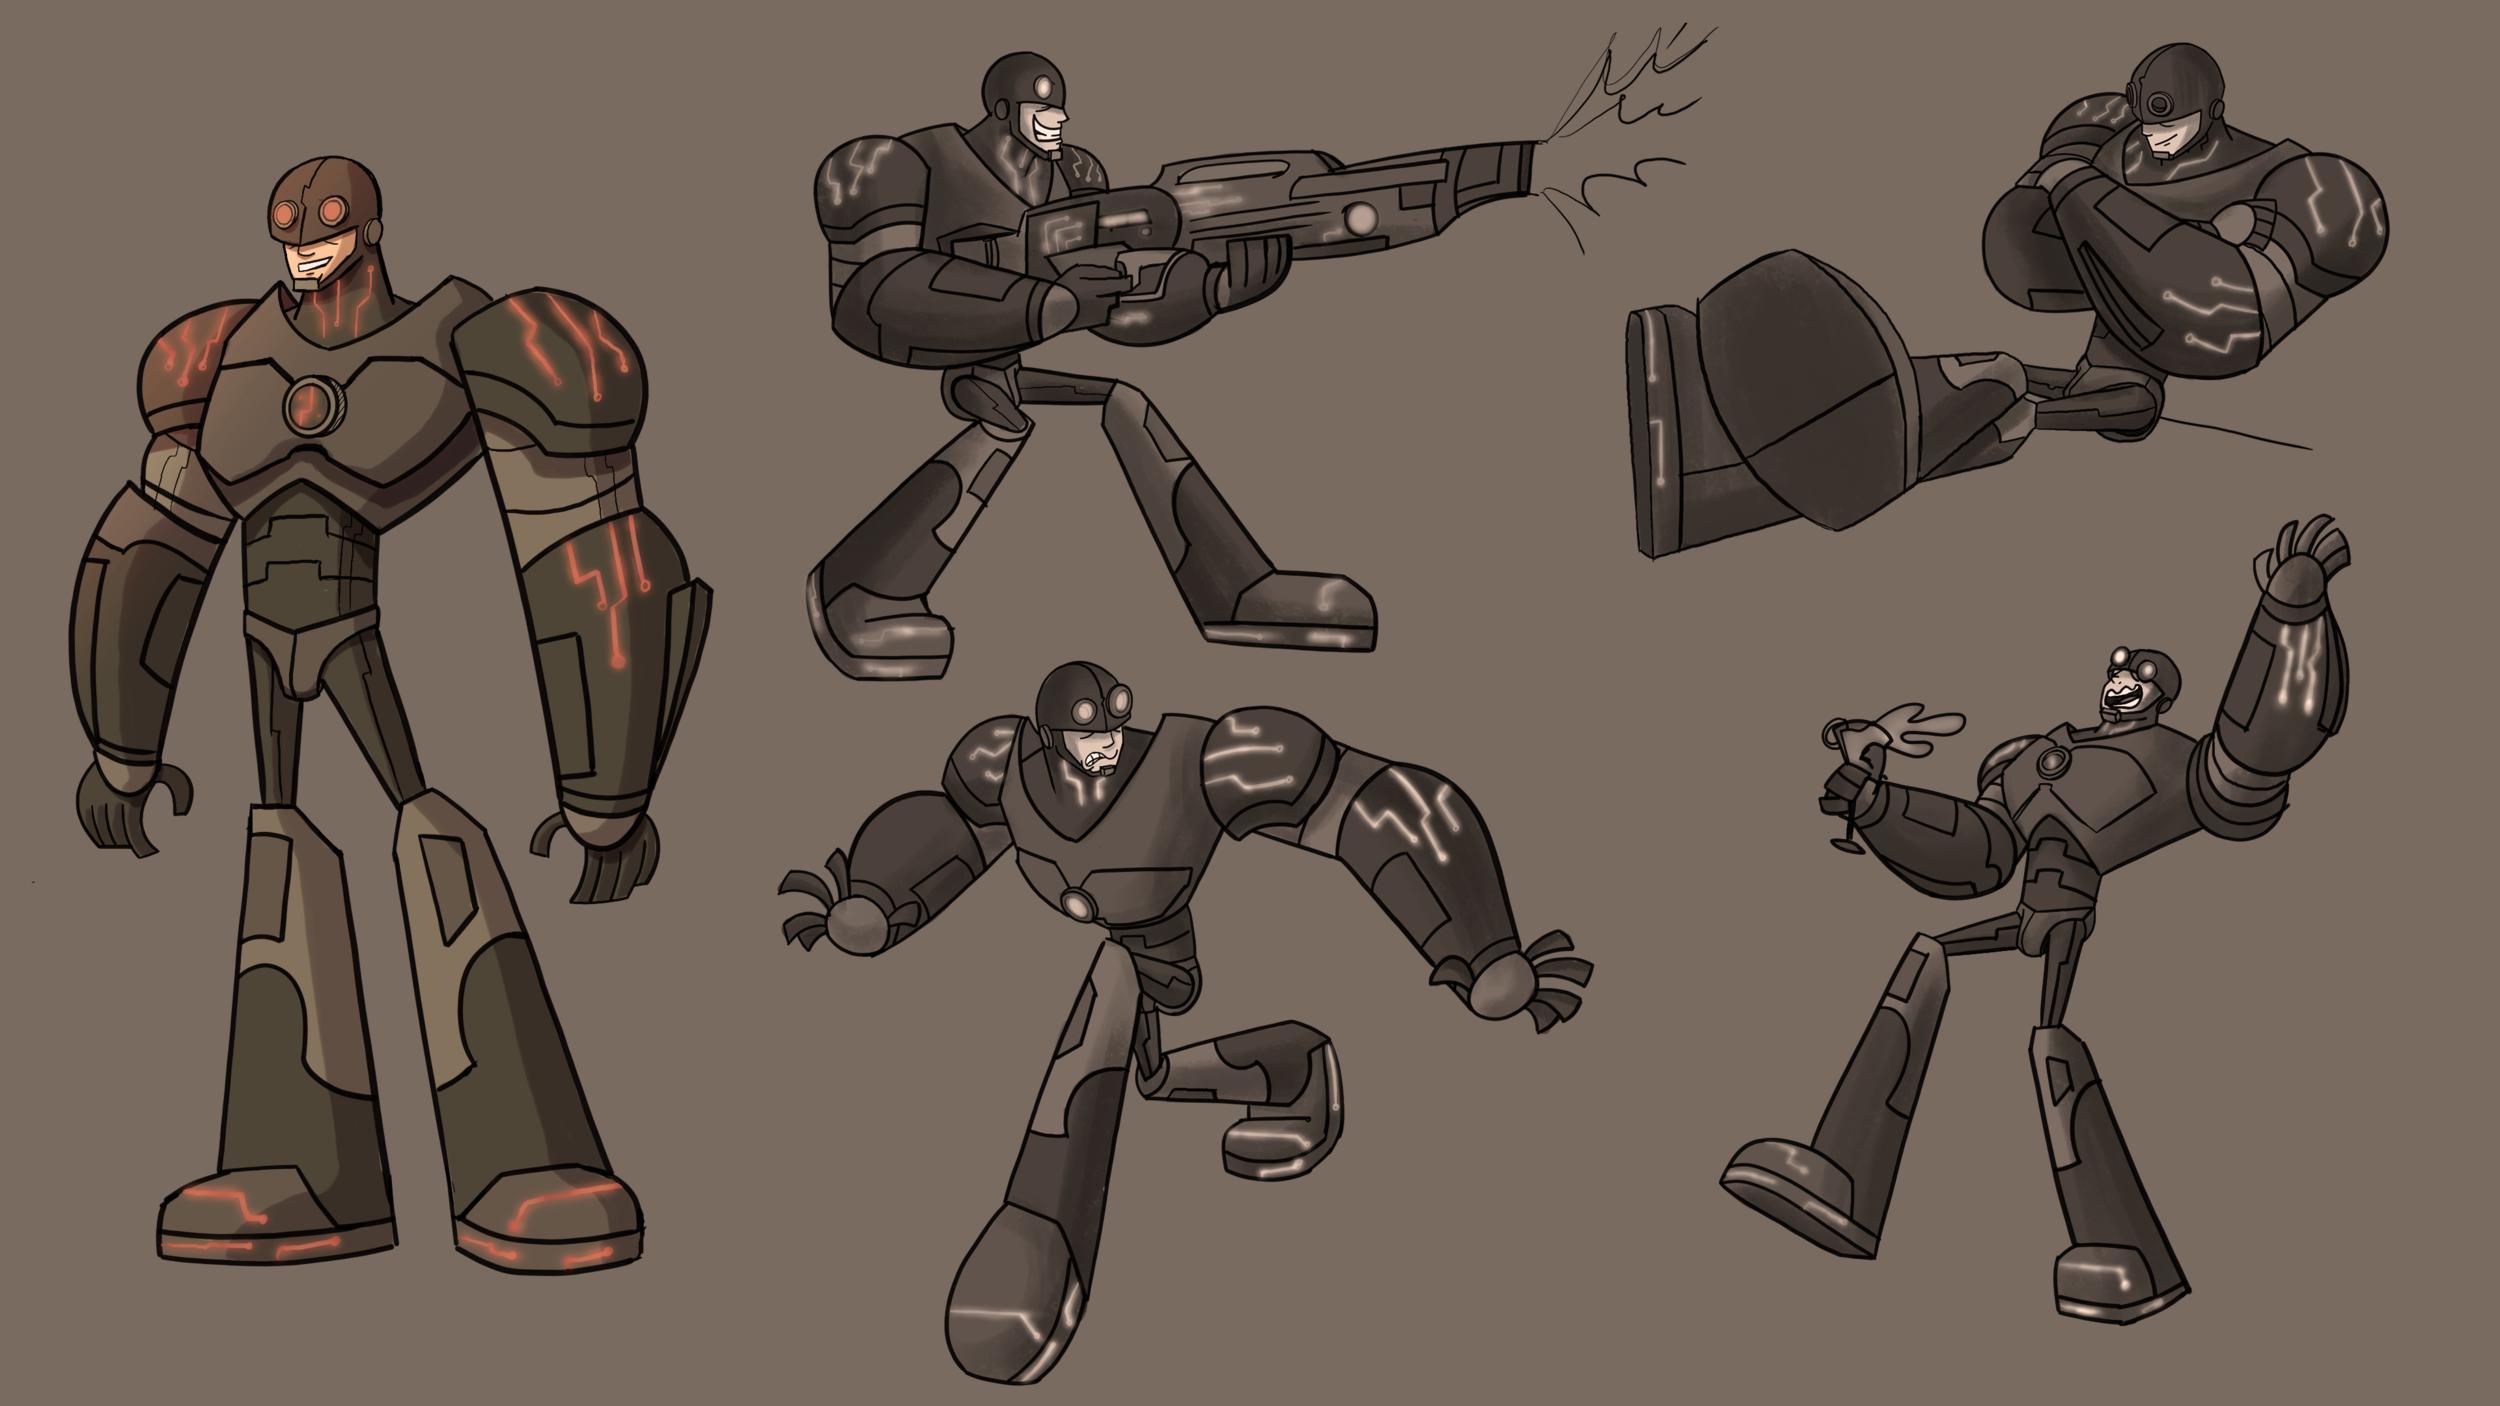 Cyborg (tin man): Final design and poses